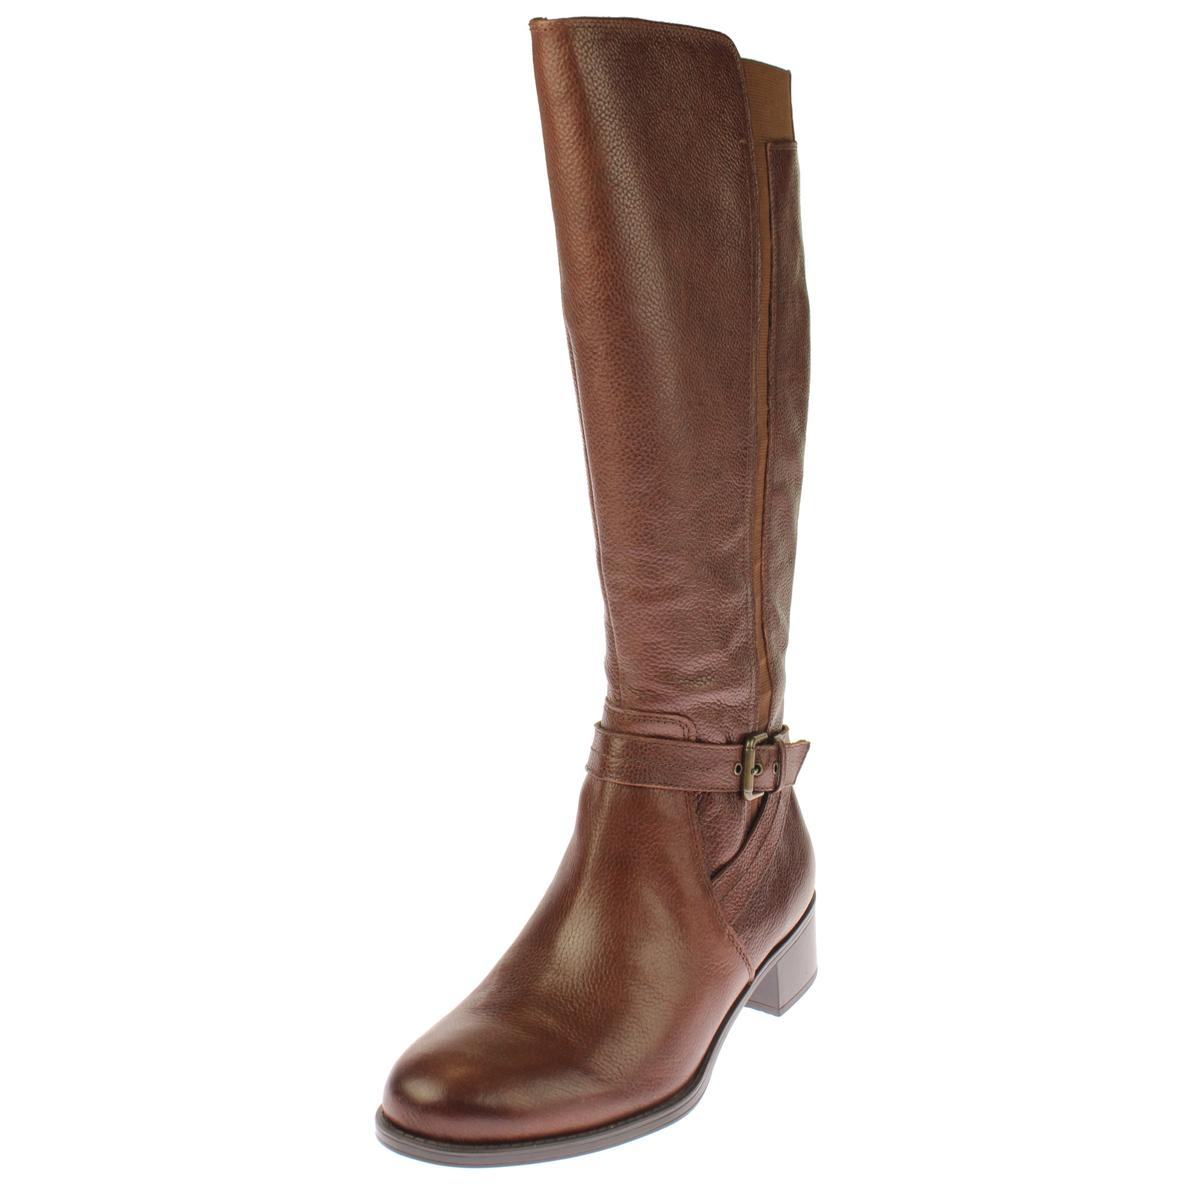 Womens Sneakers & Athletic Shoes adidas Originals Pro Model - adidas Originals For Sale US $ US $